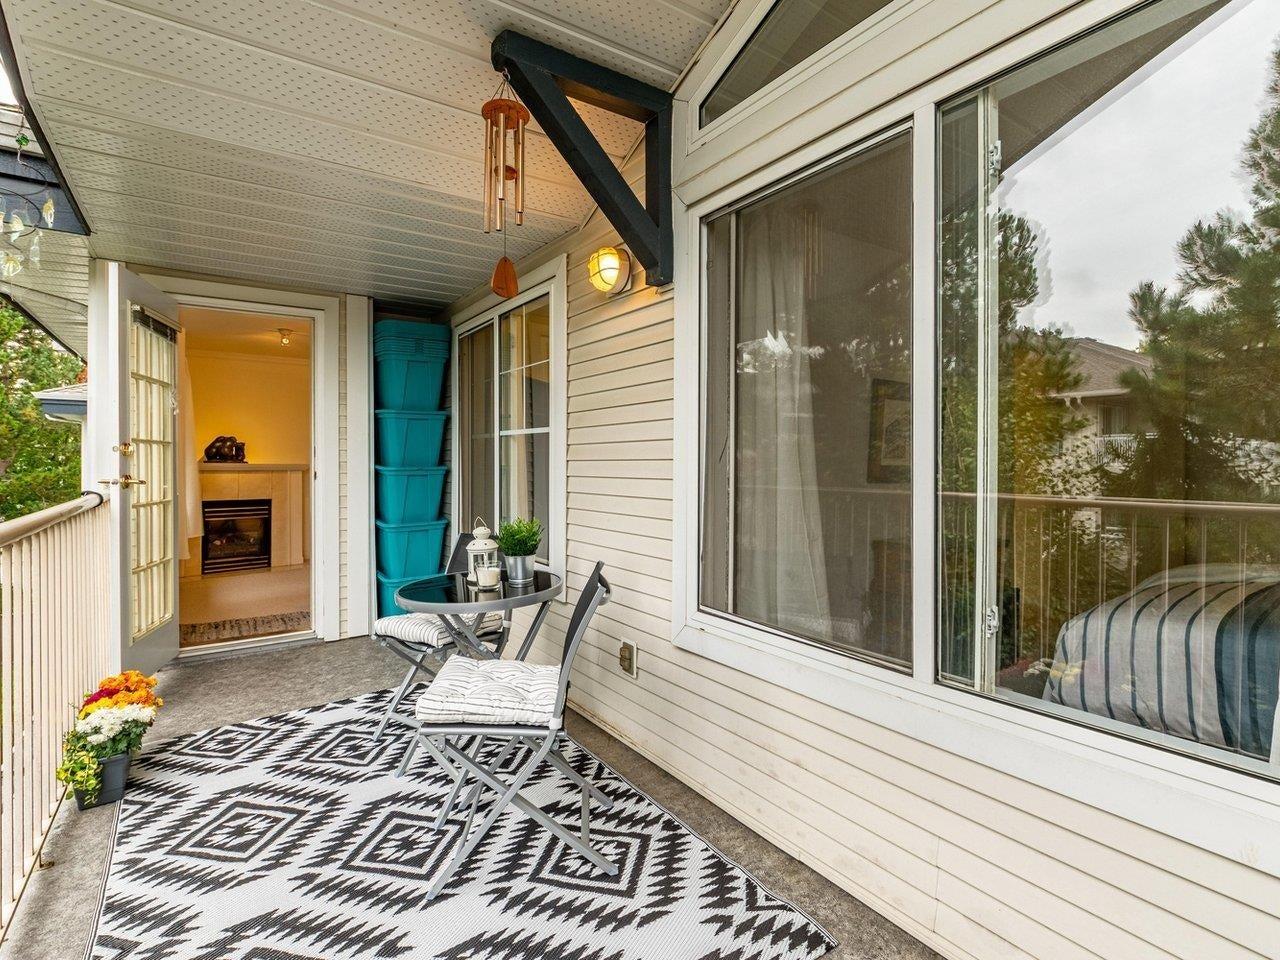 306 15298 20 AVENUE - King George Corridor Apartment/Condo for sale, 2 Bedrooms (R2625551) - #19